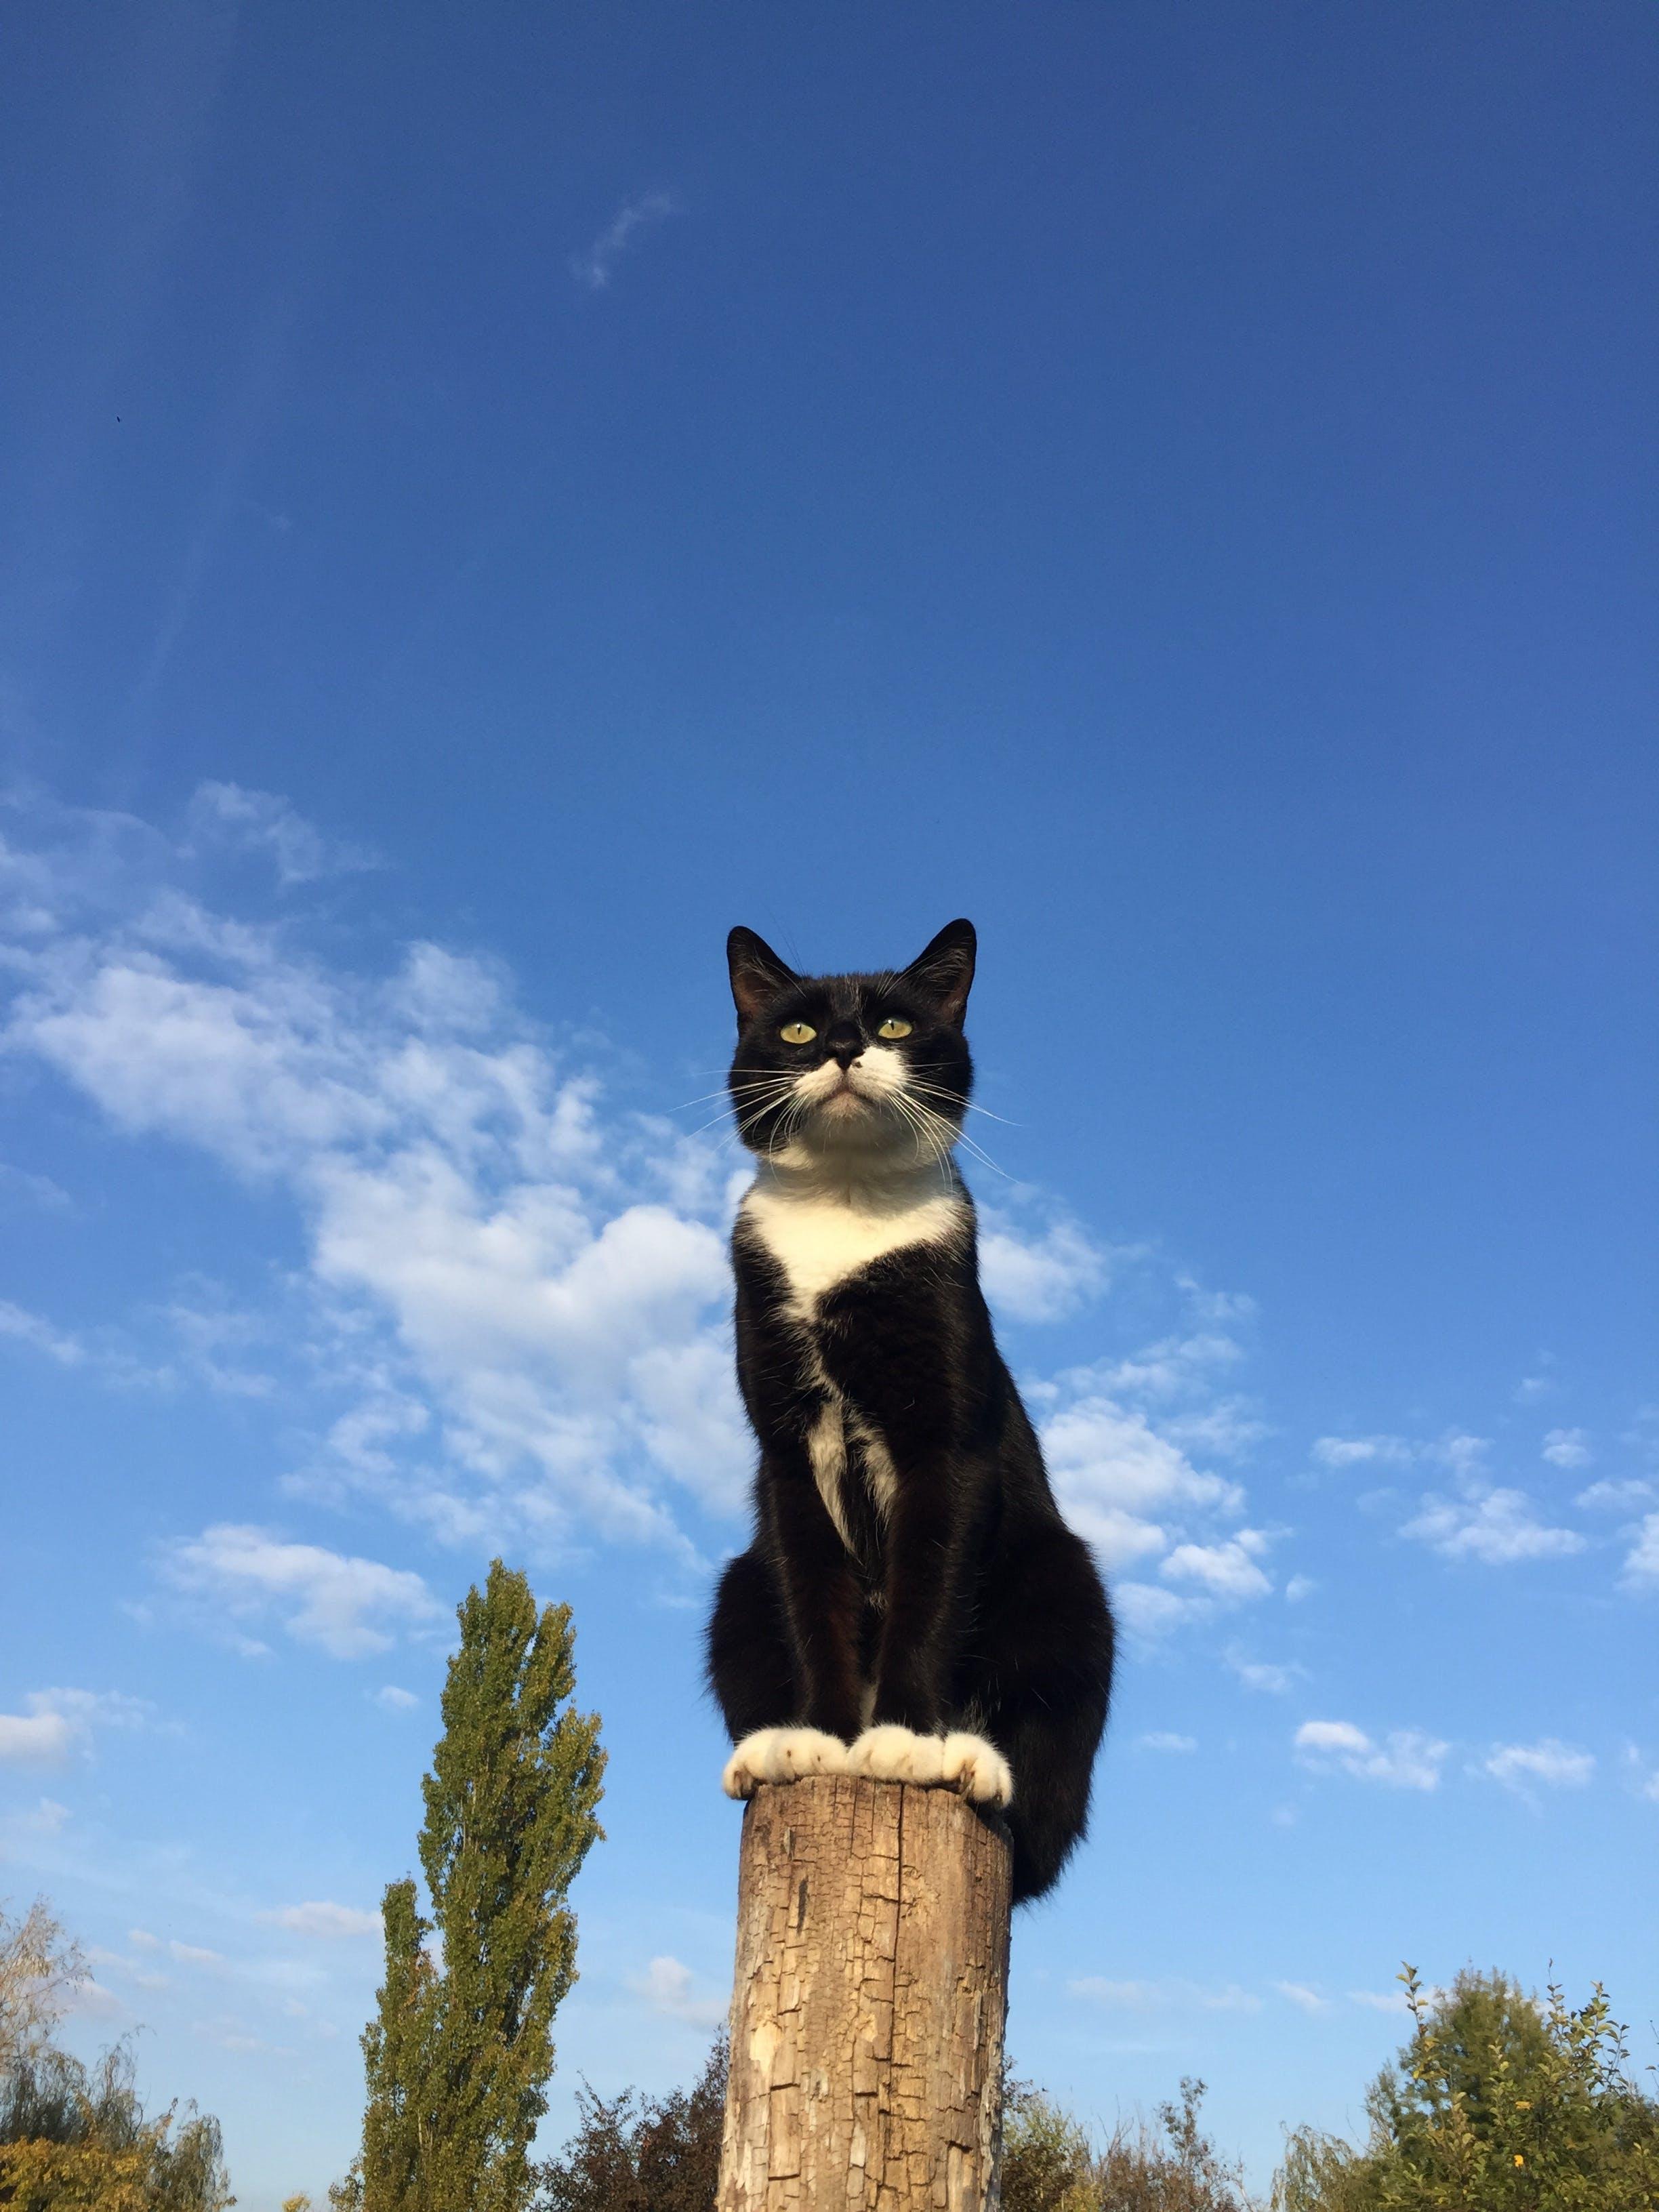 Free stock photo of sky, sitting, blue sky, cat